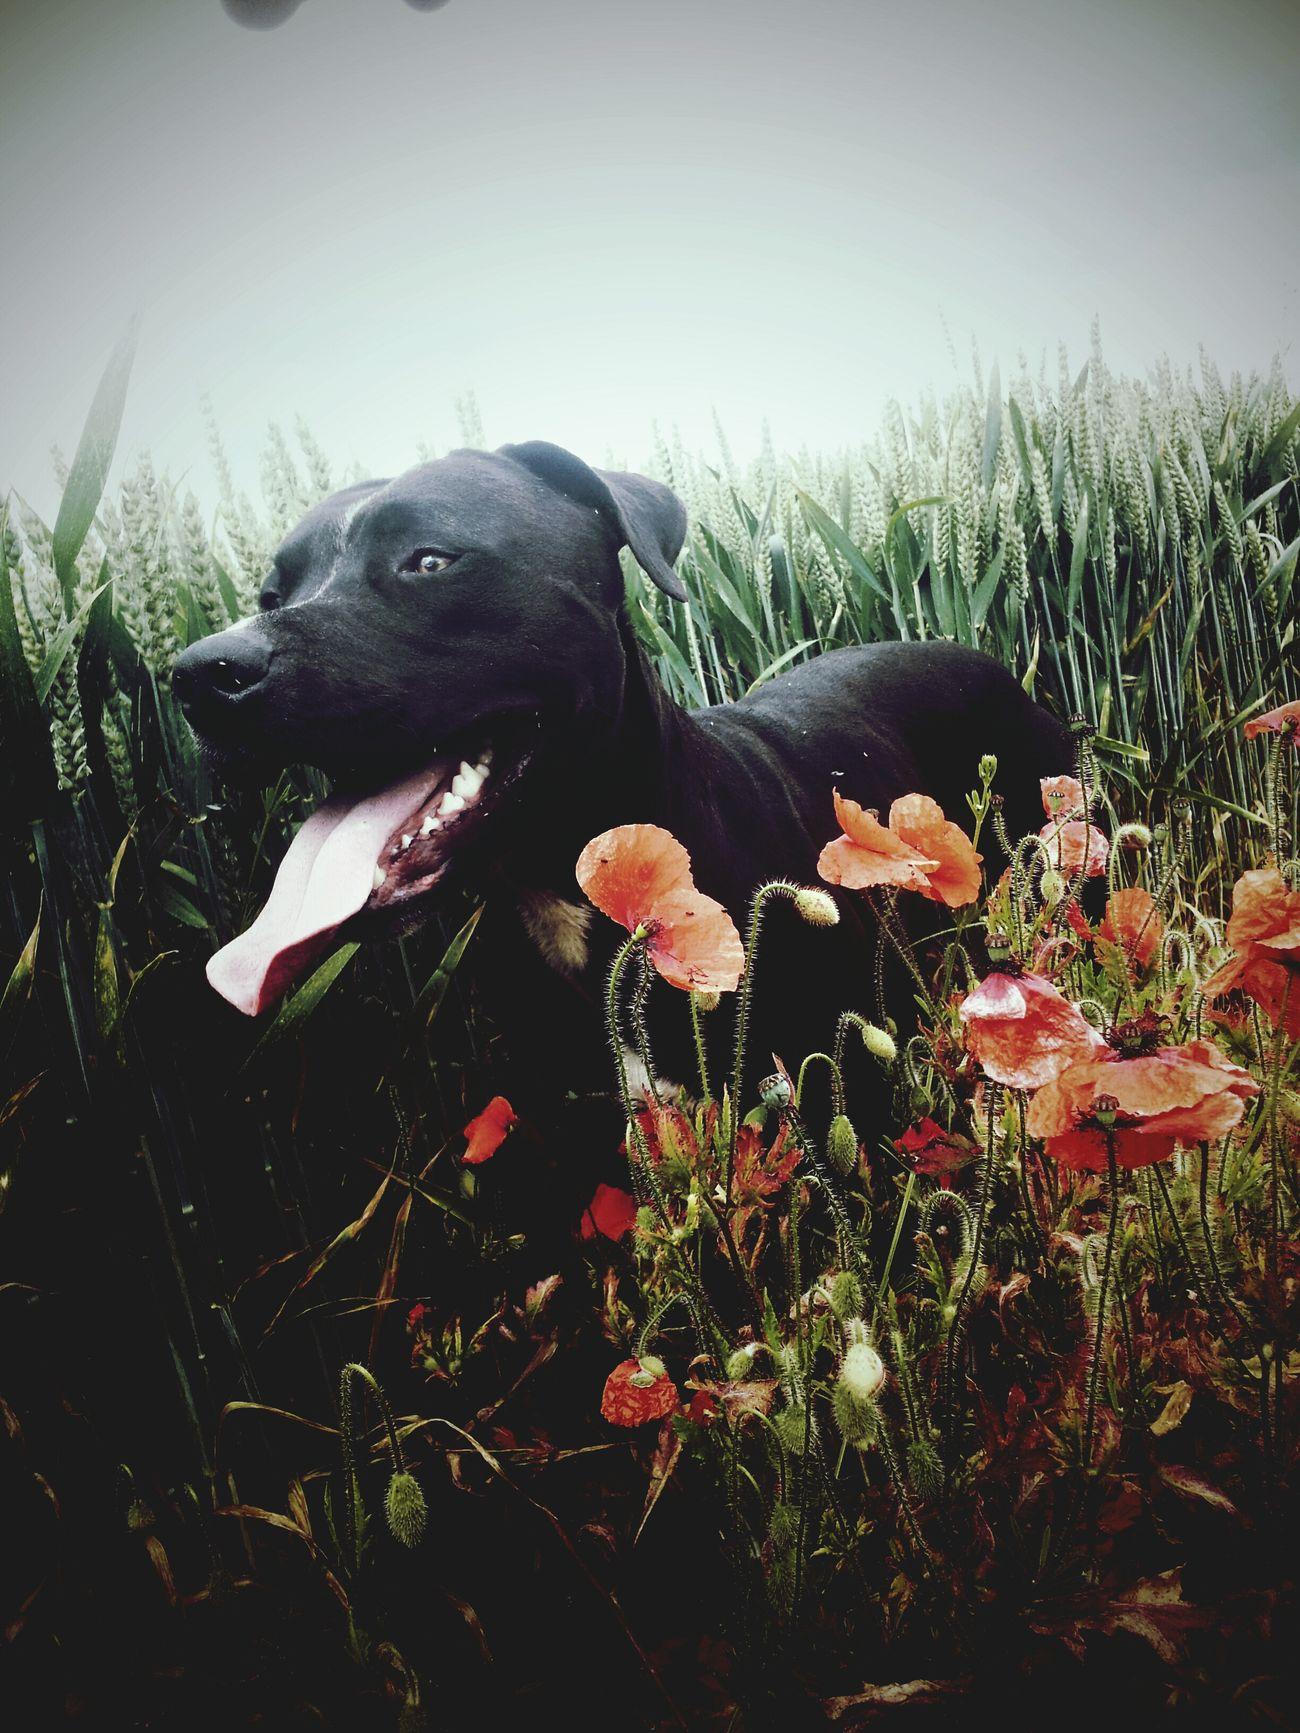 Pit Bull Pitbull LoverPet Photography  Pet Love